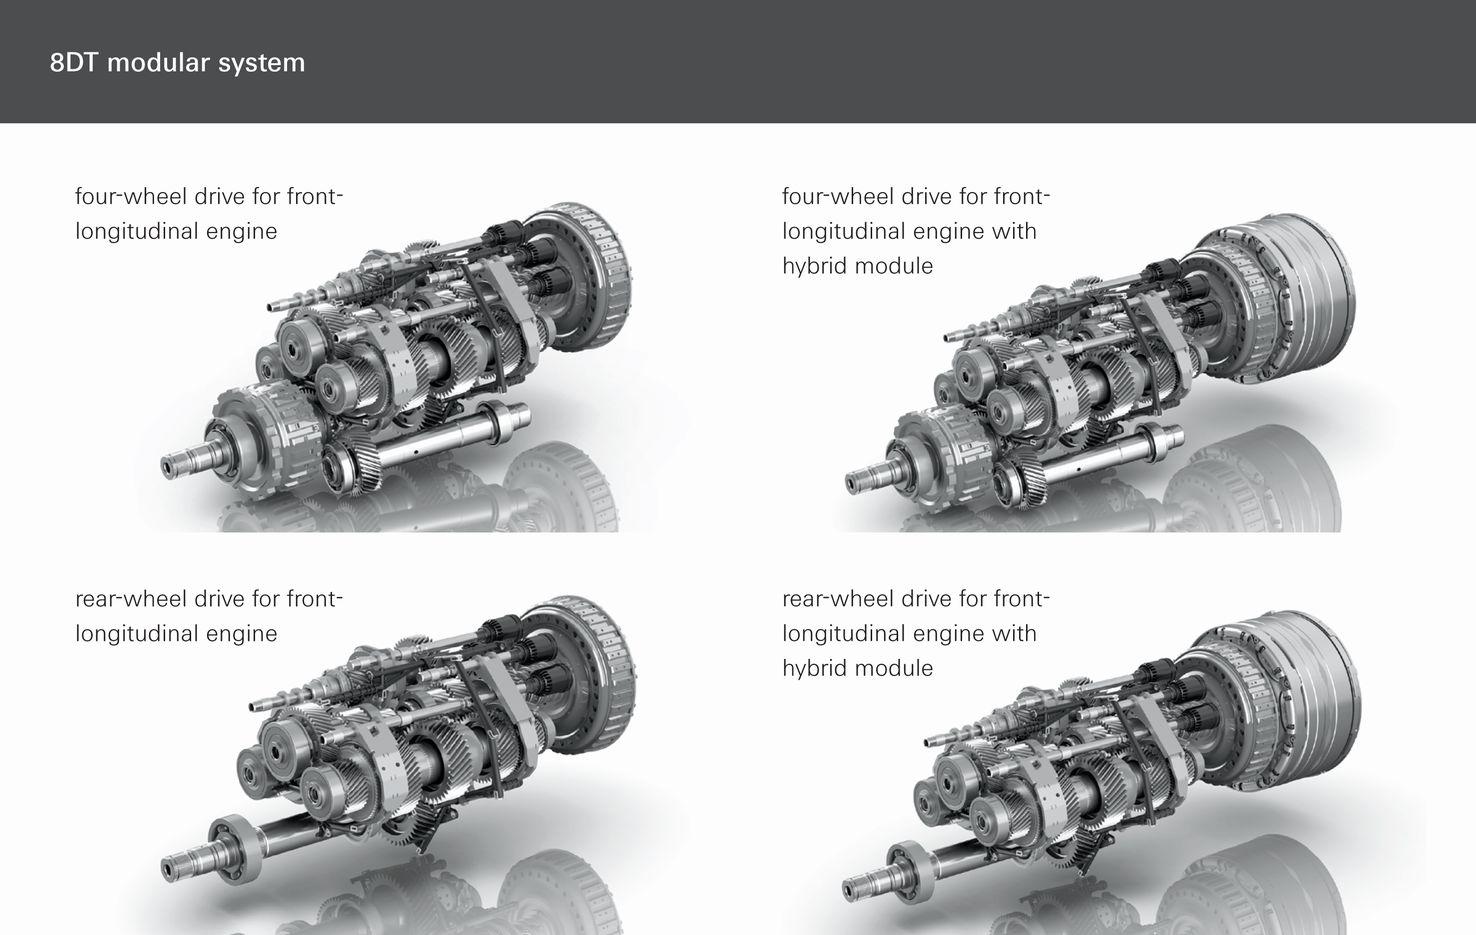 Zf、ポルシェ用の8速デュアルクラッチ・トランスミッションに統合ハイブリッド・モジュールを追加 Clicccar